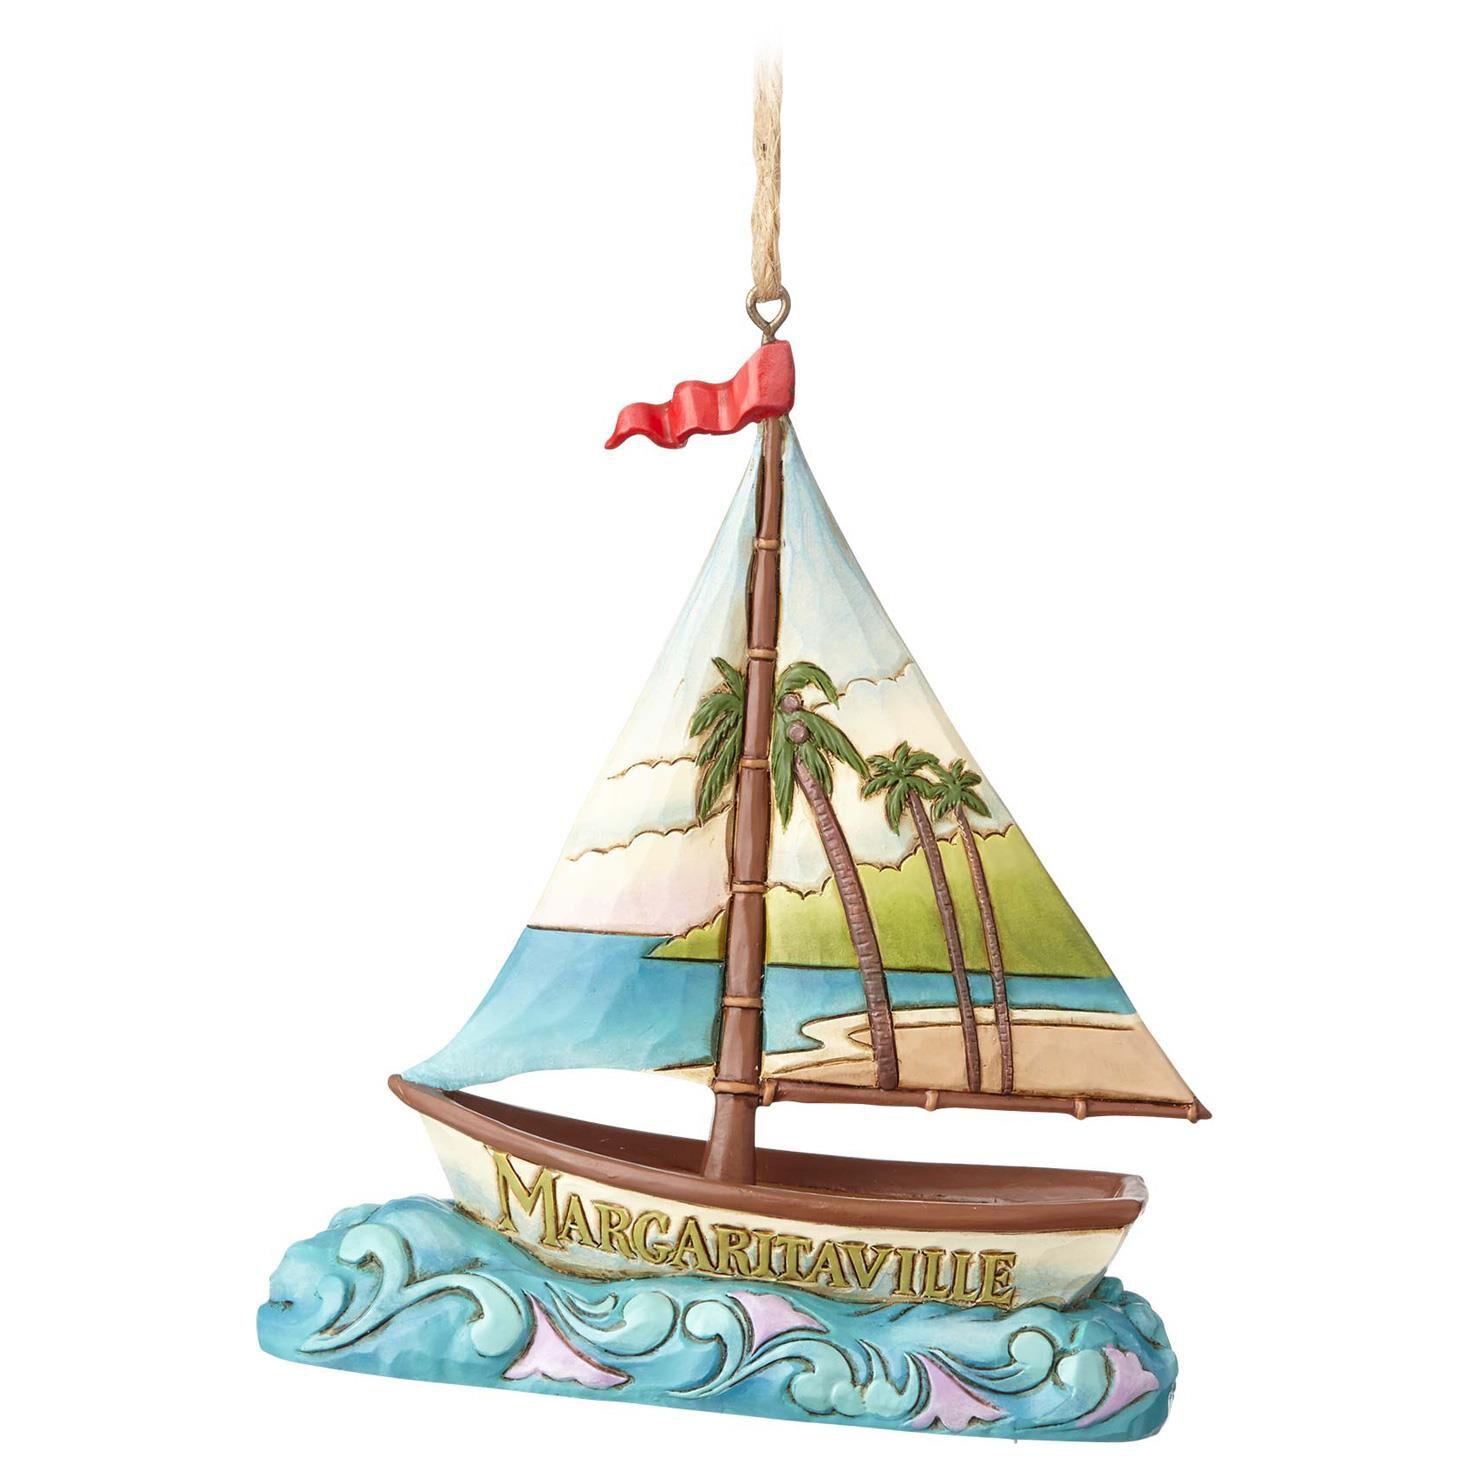 Jim Shore® Margaritaville Sailboat Ornament  Specialty Ornaments  Hallmark